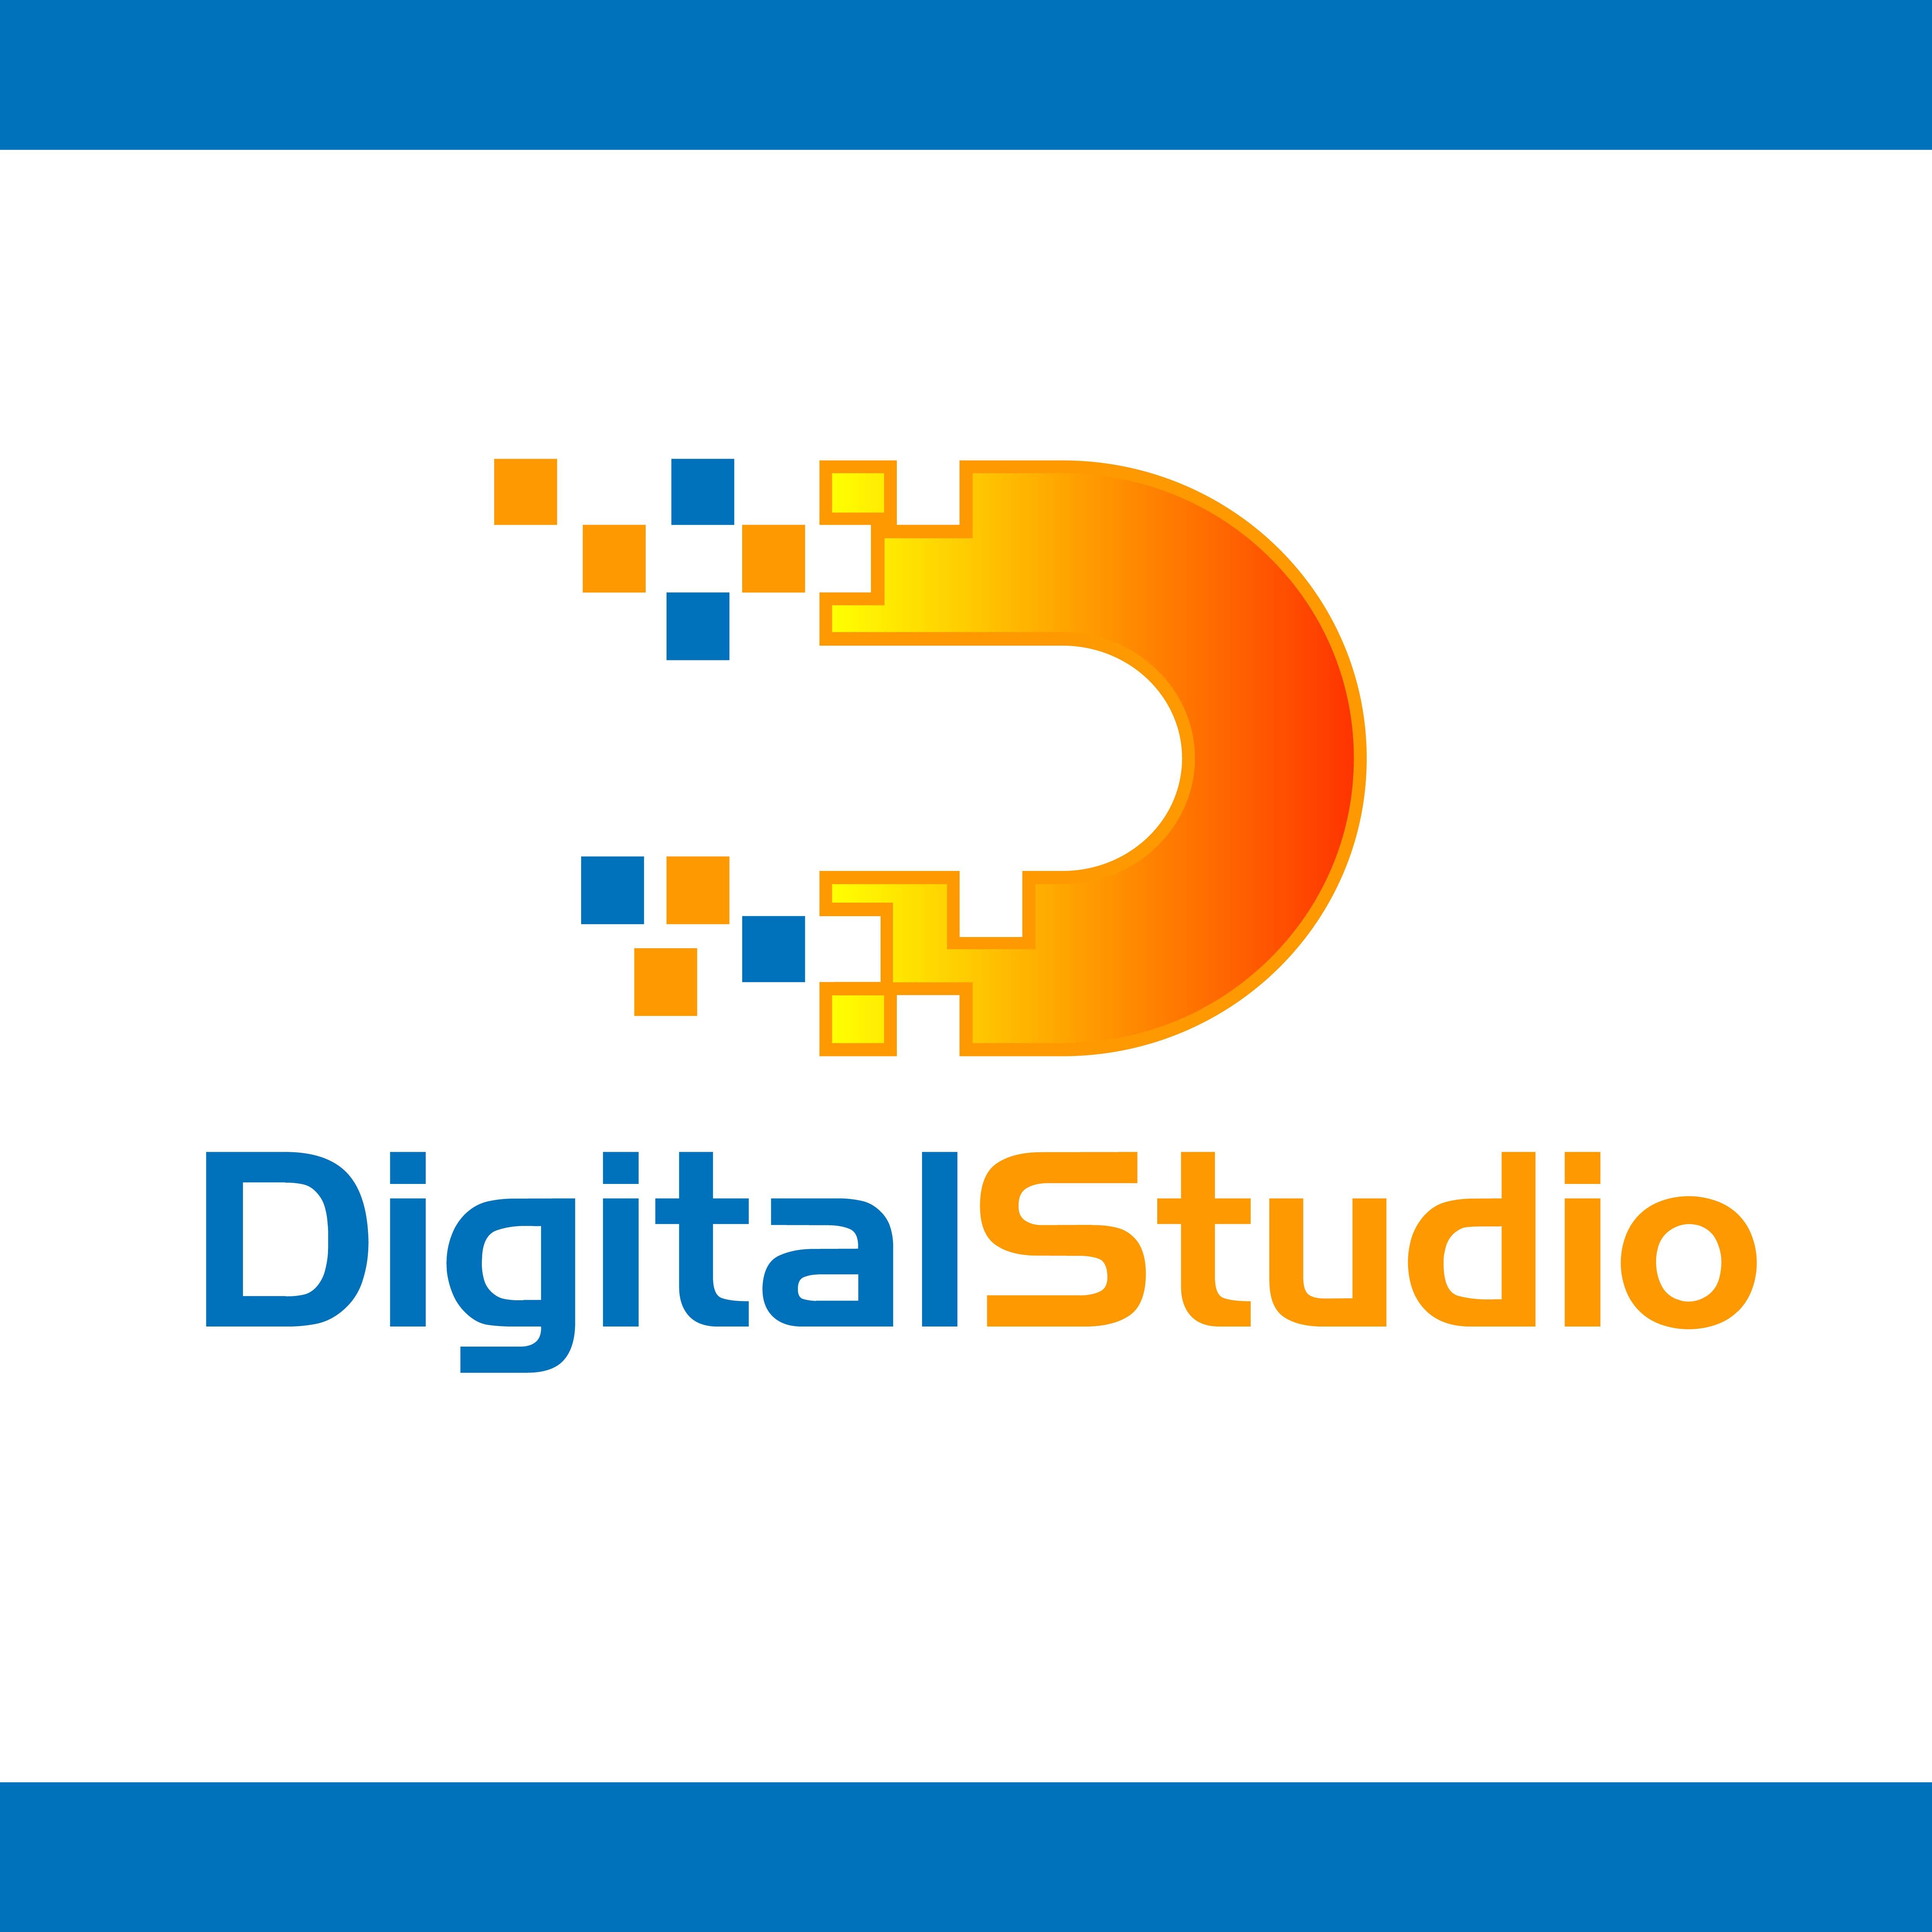 Modern Digital Studio Logo Design